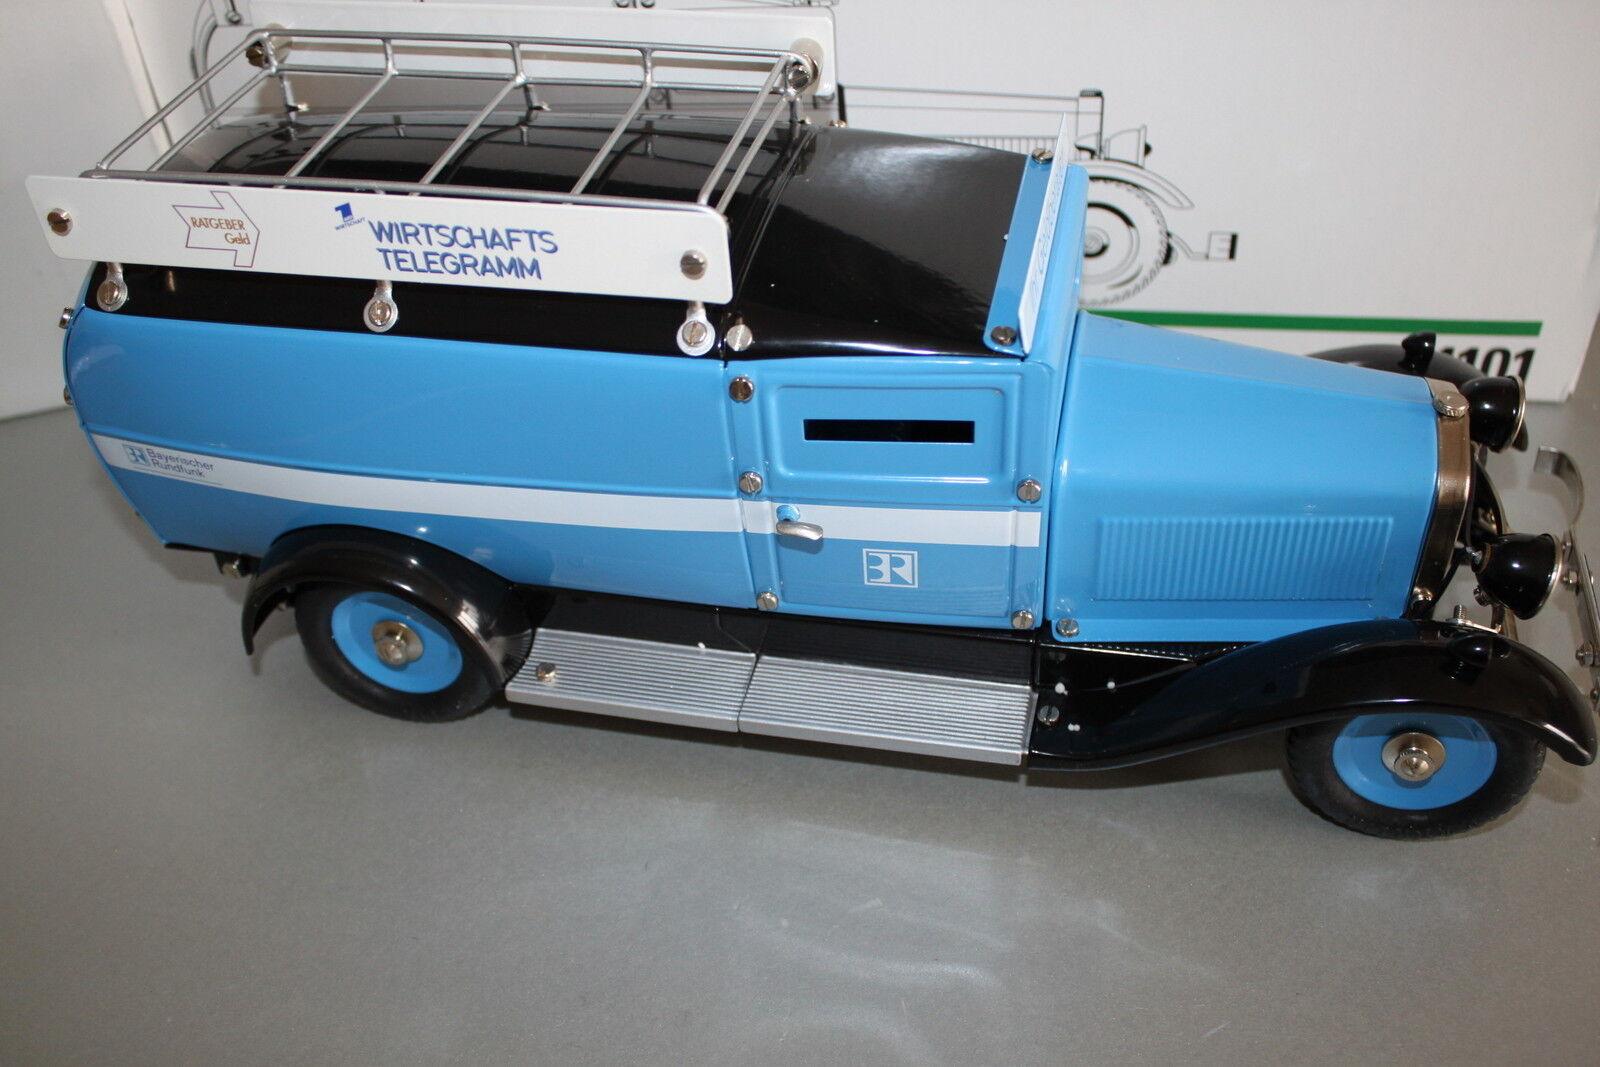 Märklin 1101 camions Bavière radio fourgon 1 16 OVP